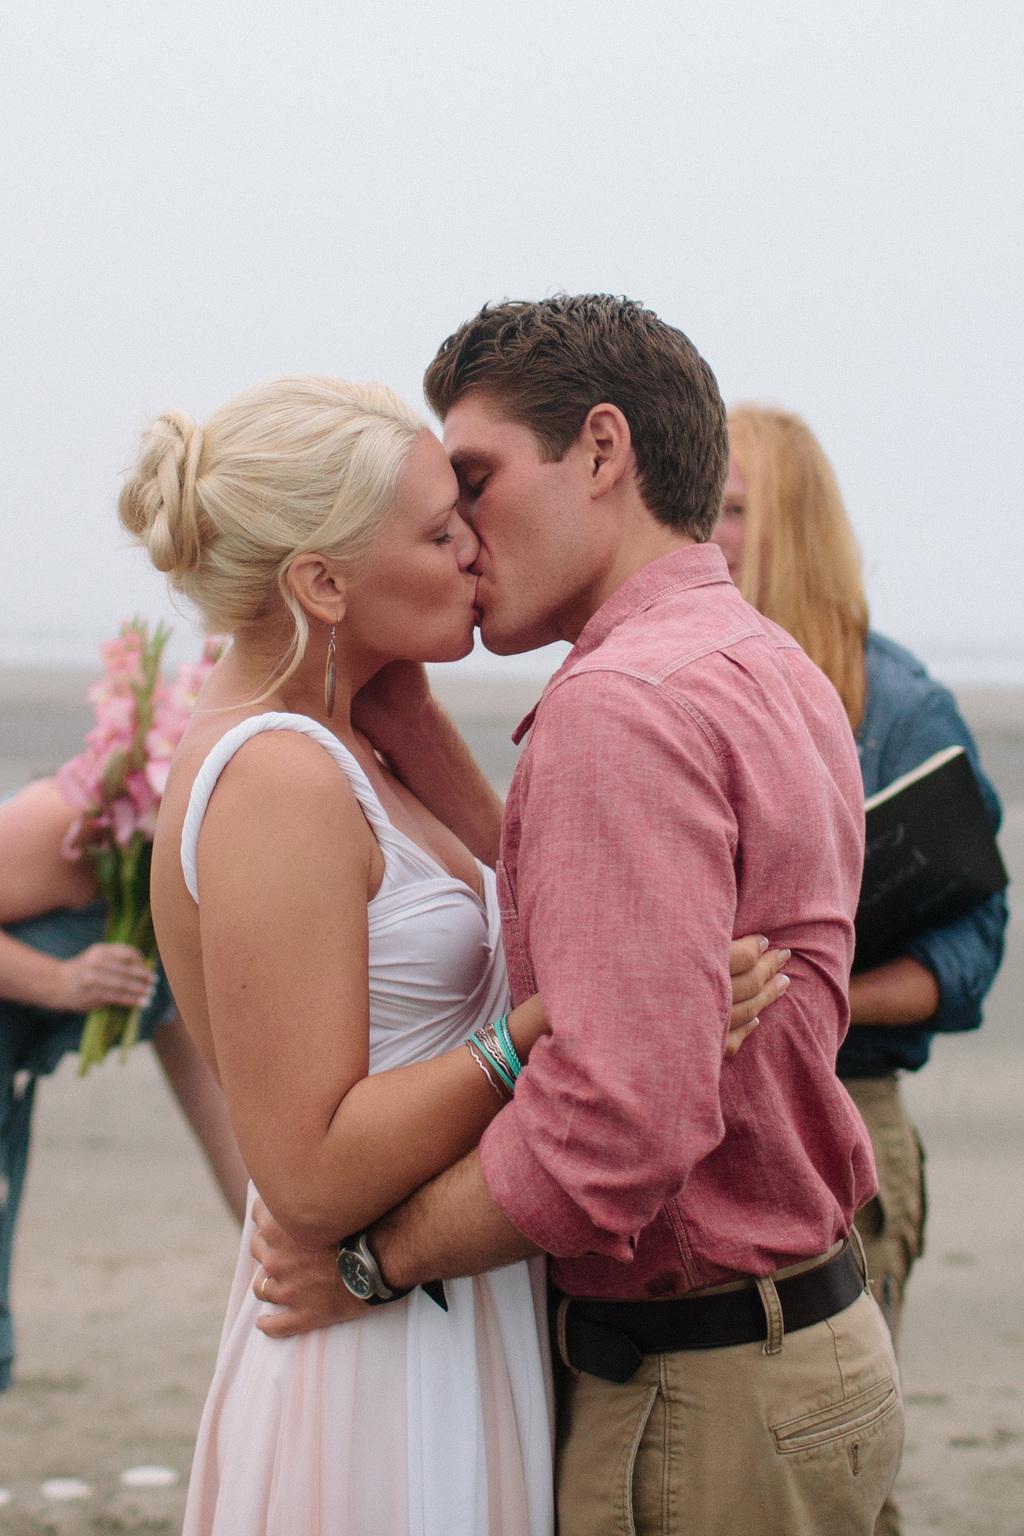 Coffey-wood-beach-real-wedding-linhbergh-photography-bride-groom-kiss-ceremony.full